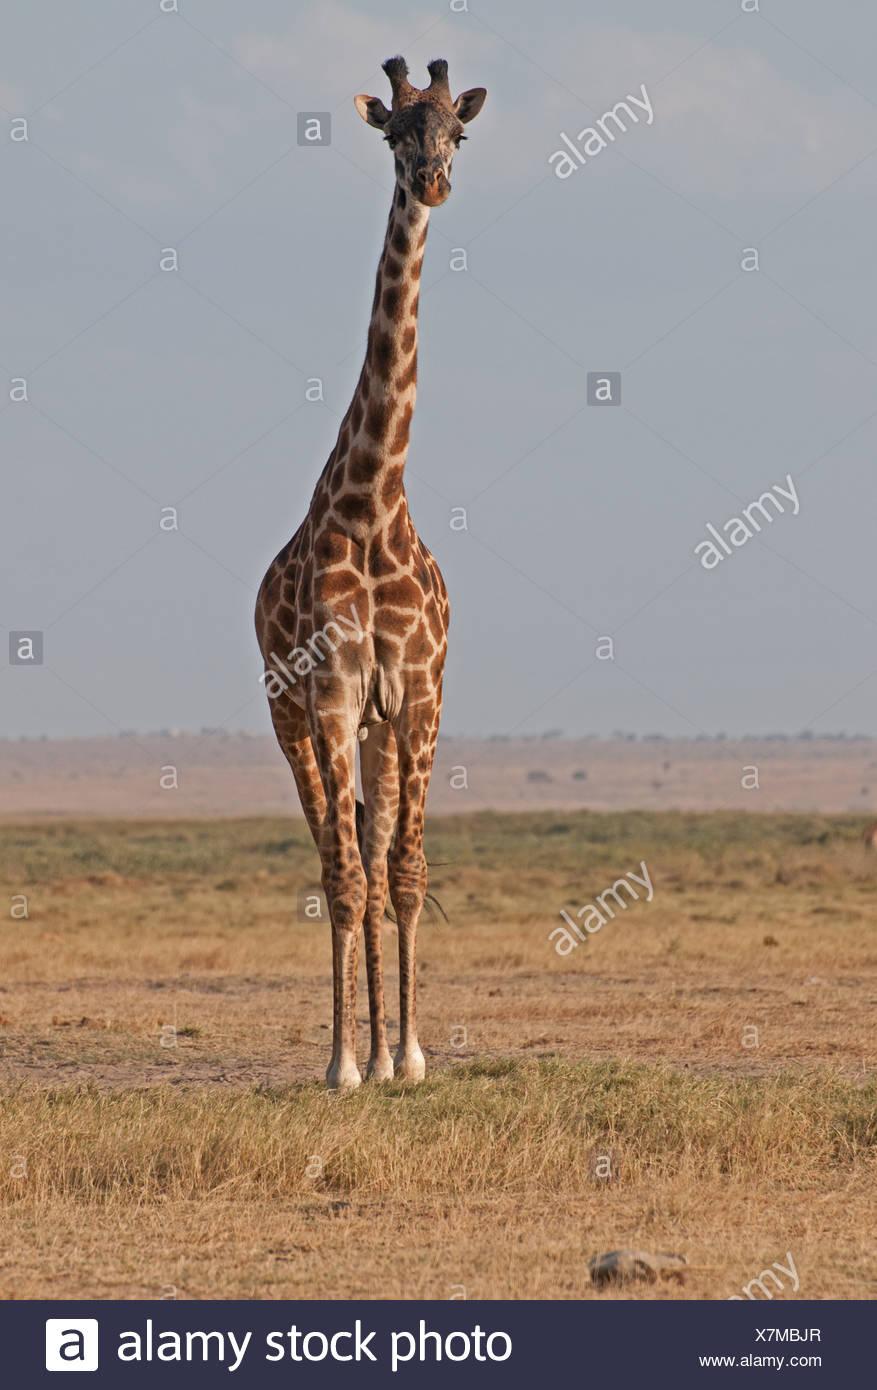 Giraffa comune in Amboseli National Park in Kenya Africa orientale Immagini Stock